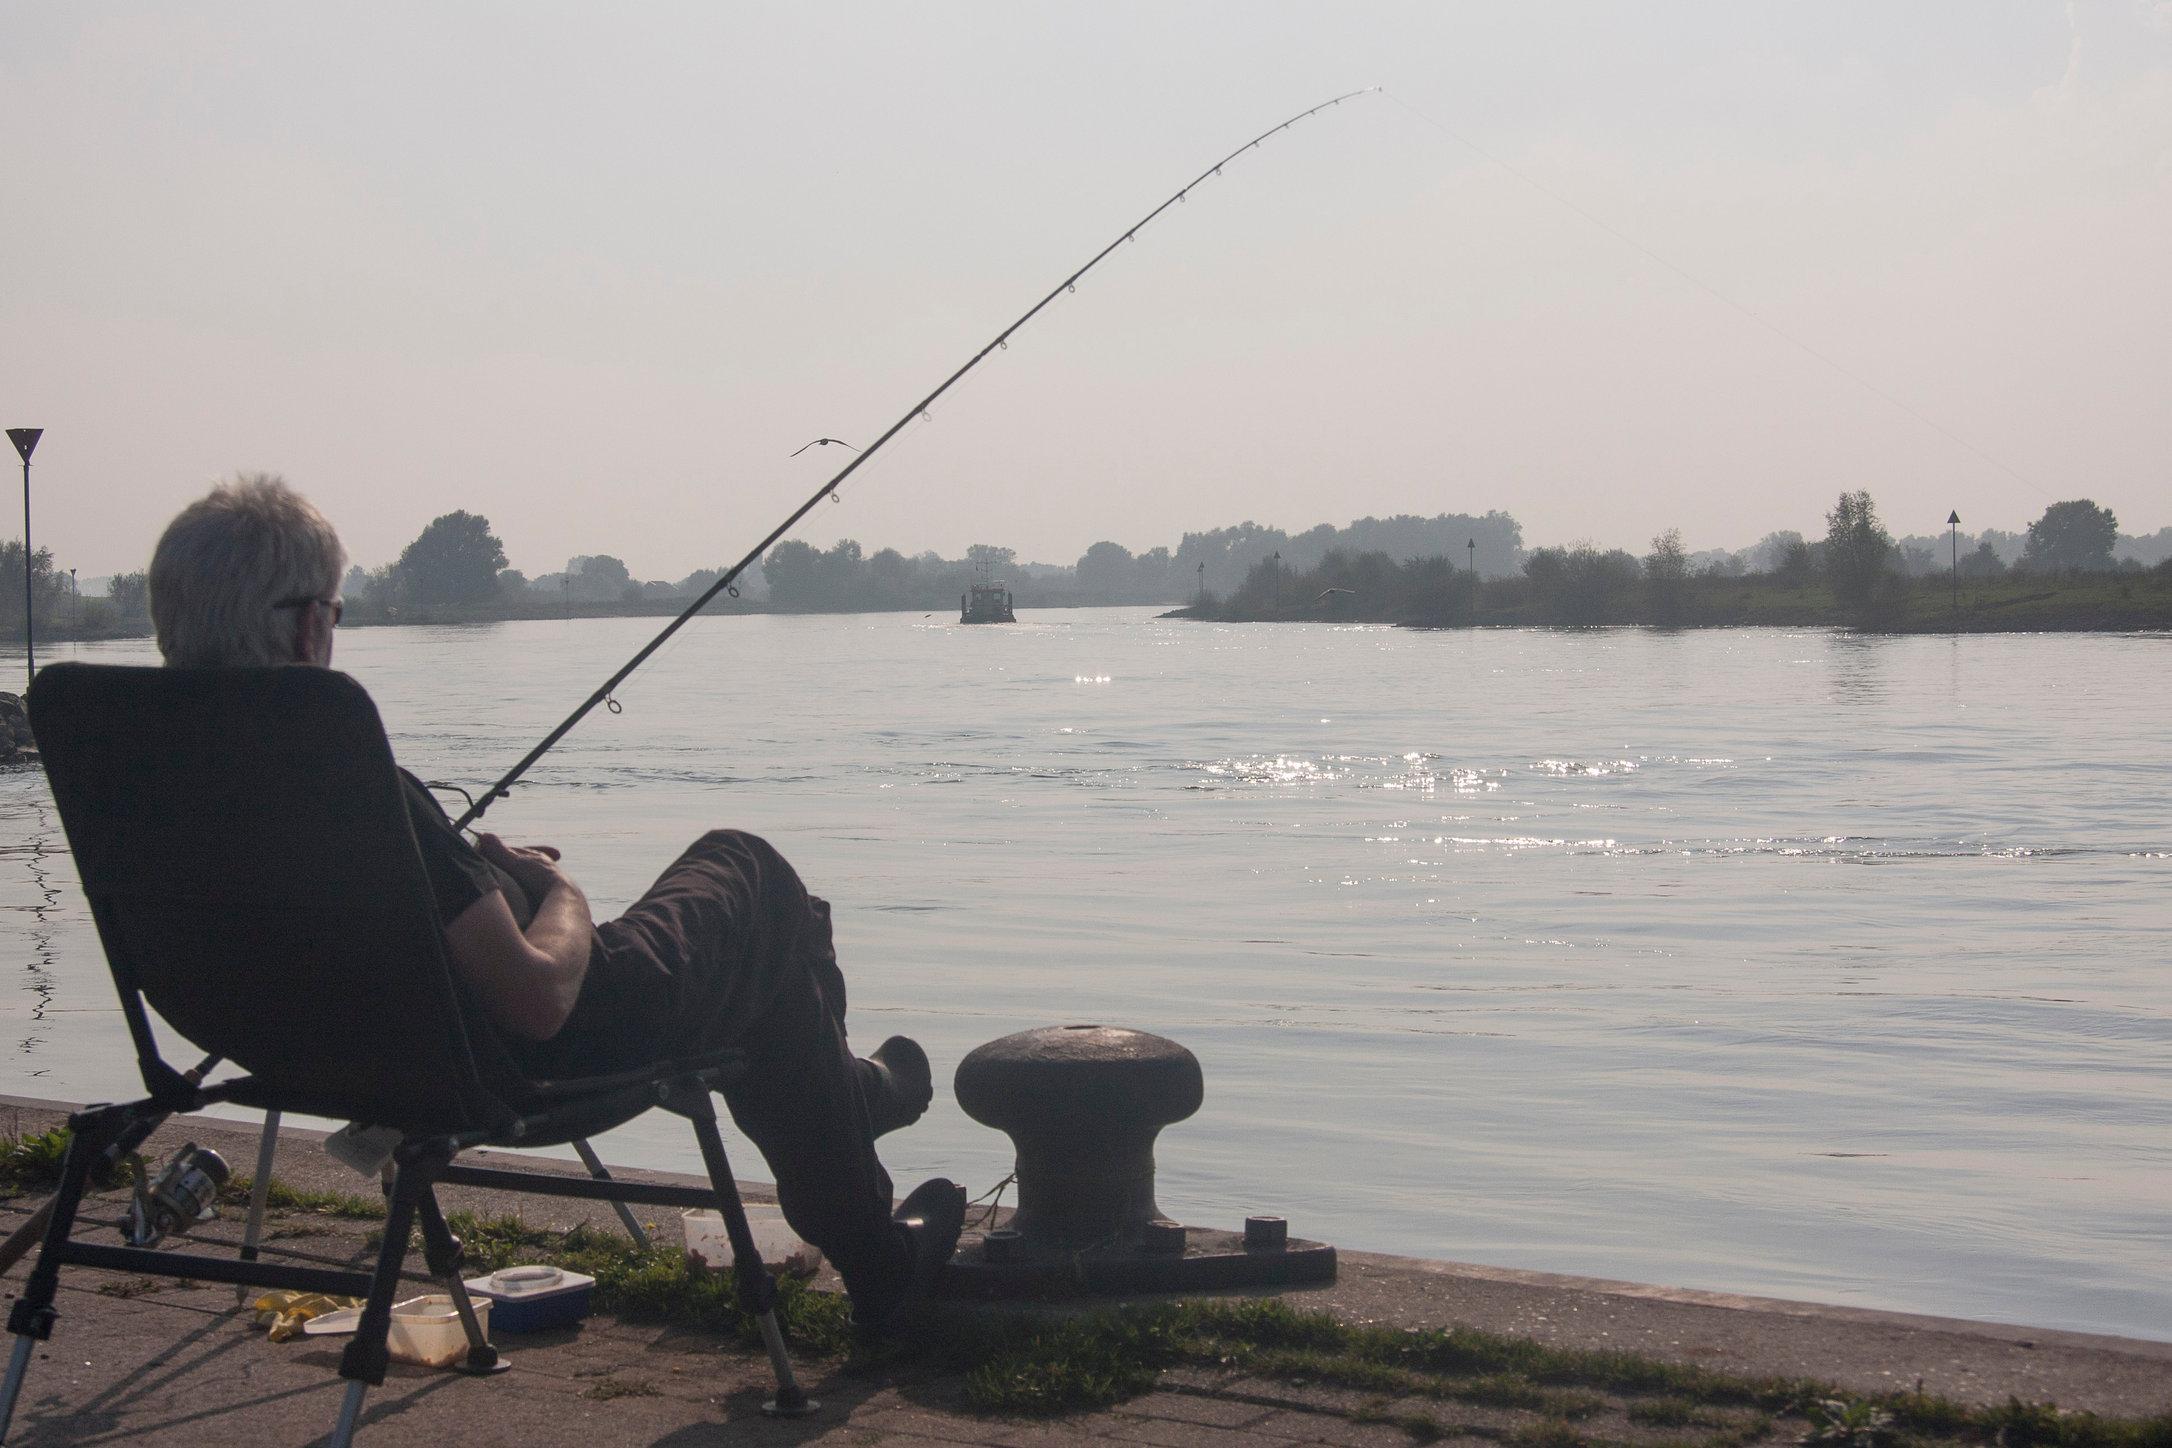 Fishig at the river IJssel